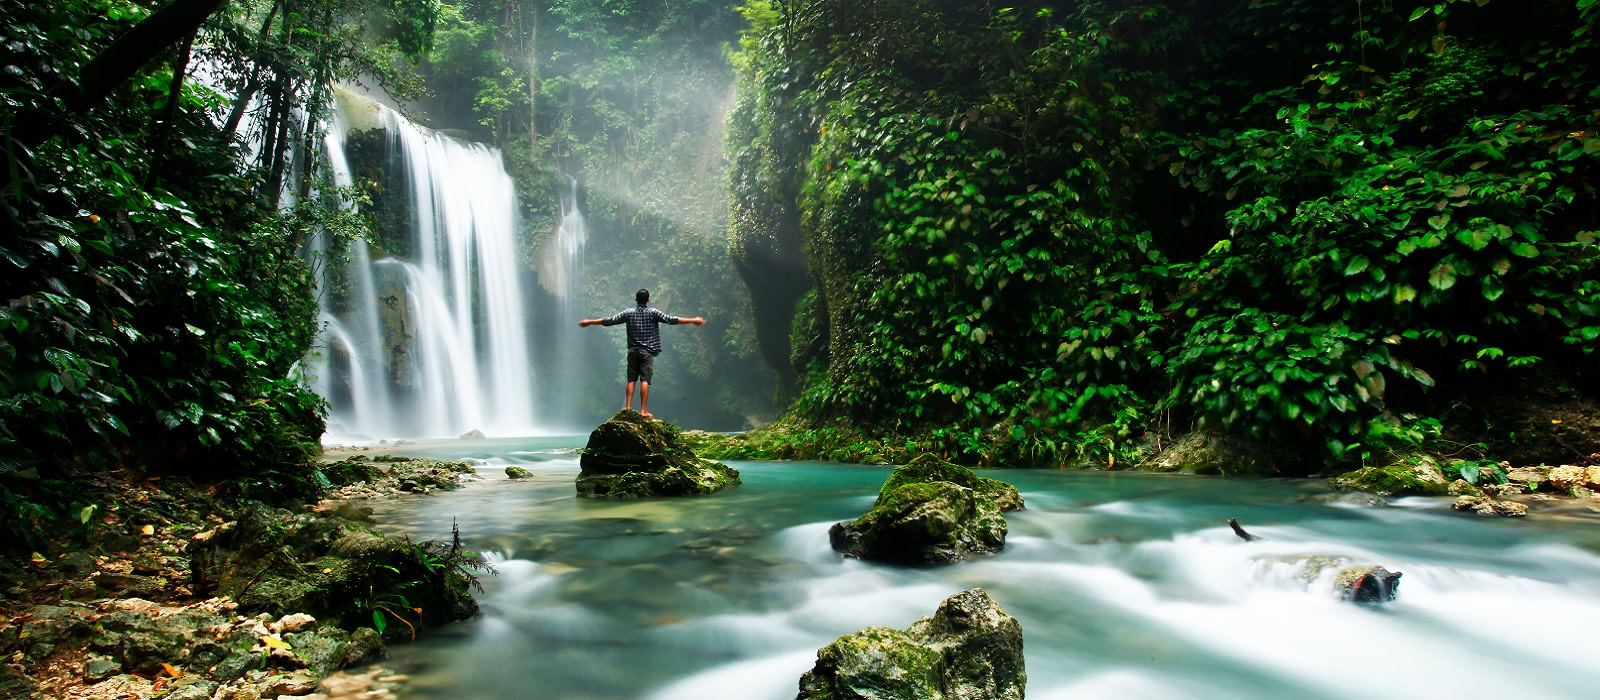 Reiseziel Sulawesi, Luwuk Indonesien